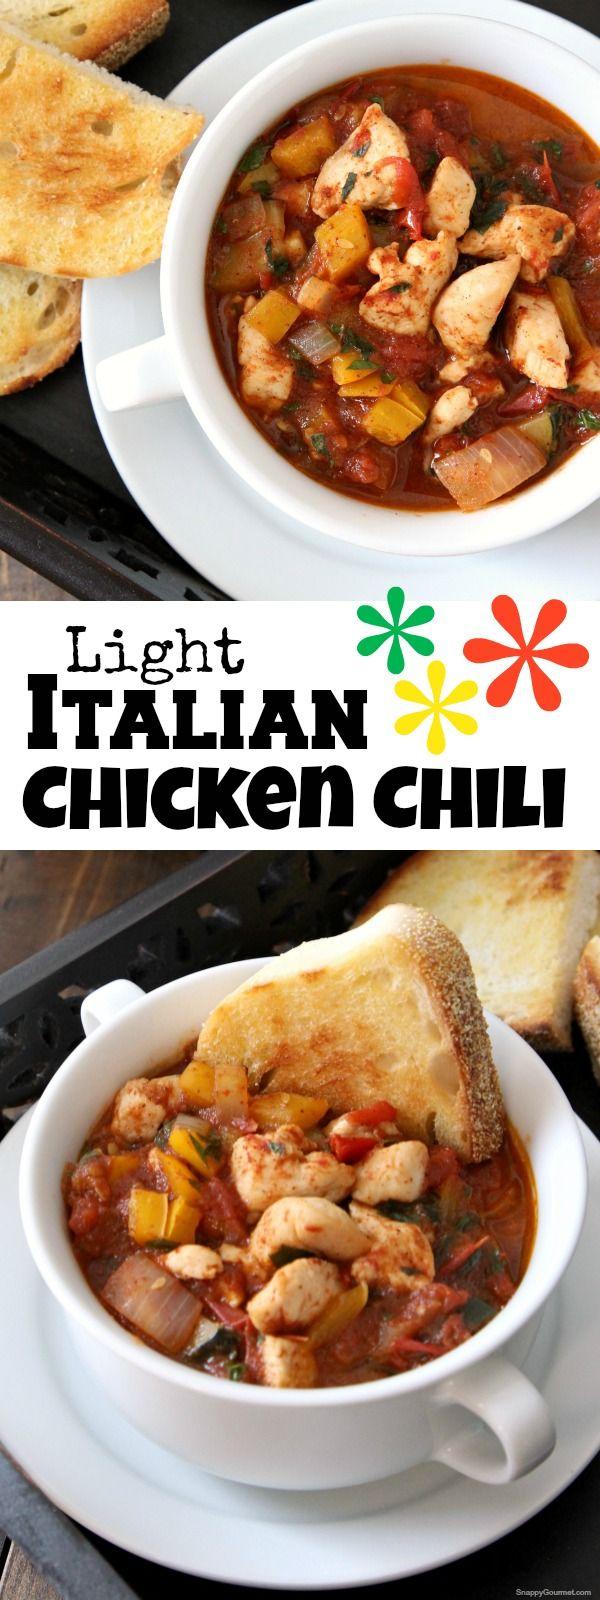 Light Italian Chicken Chili, easy homemade chili recipe with @CountryCrock! SnappyGourmet.com (sponsored)